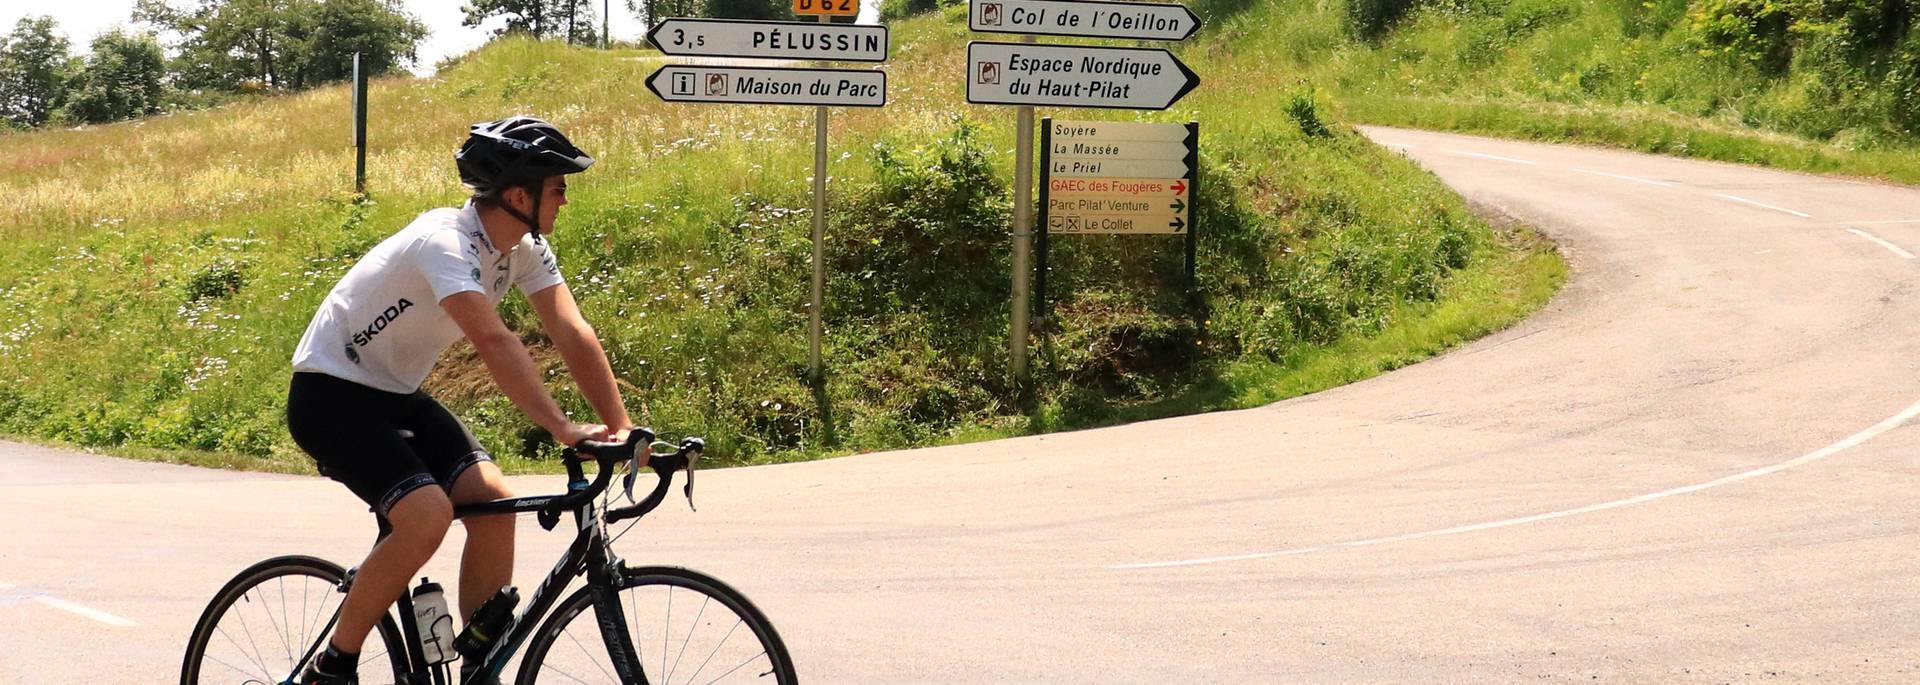 col de l'oeillon cyclisme